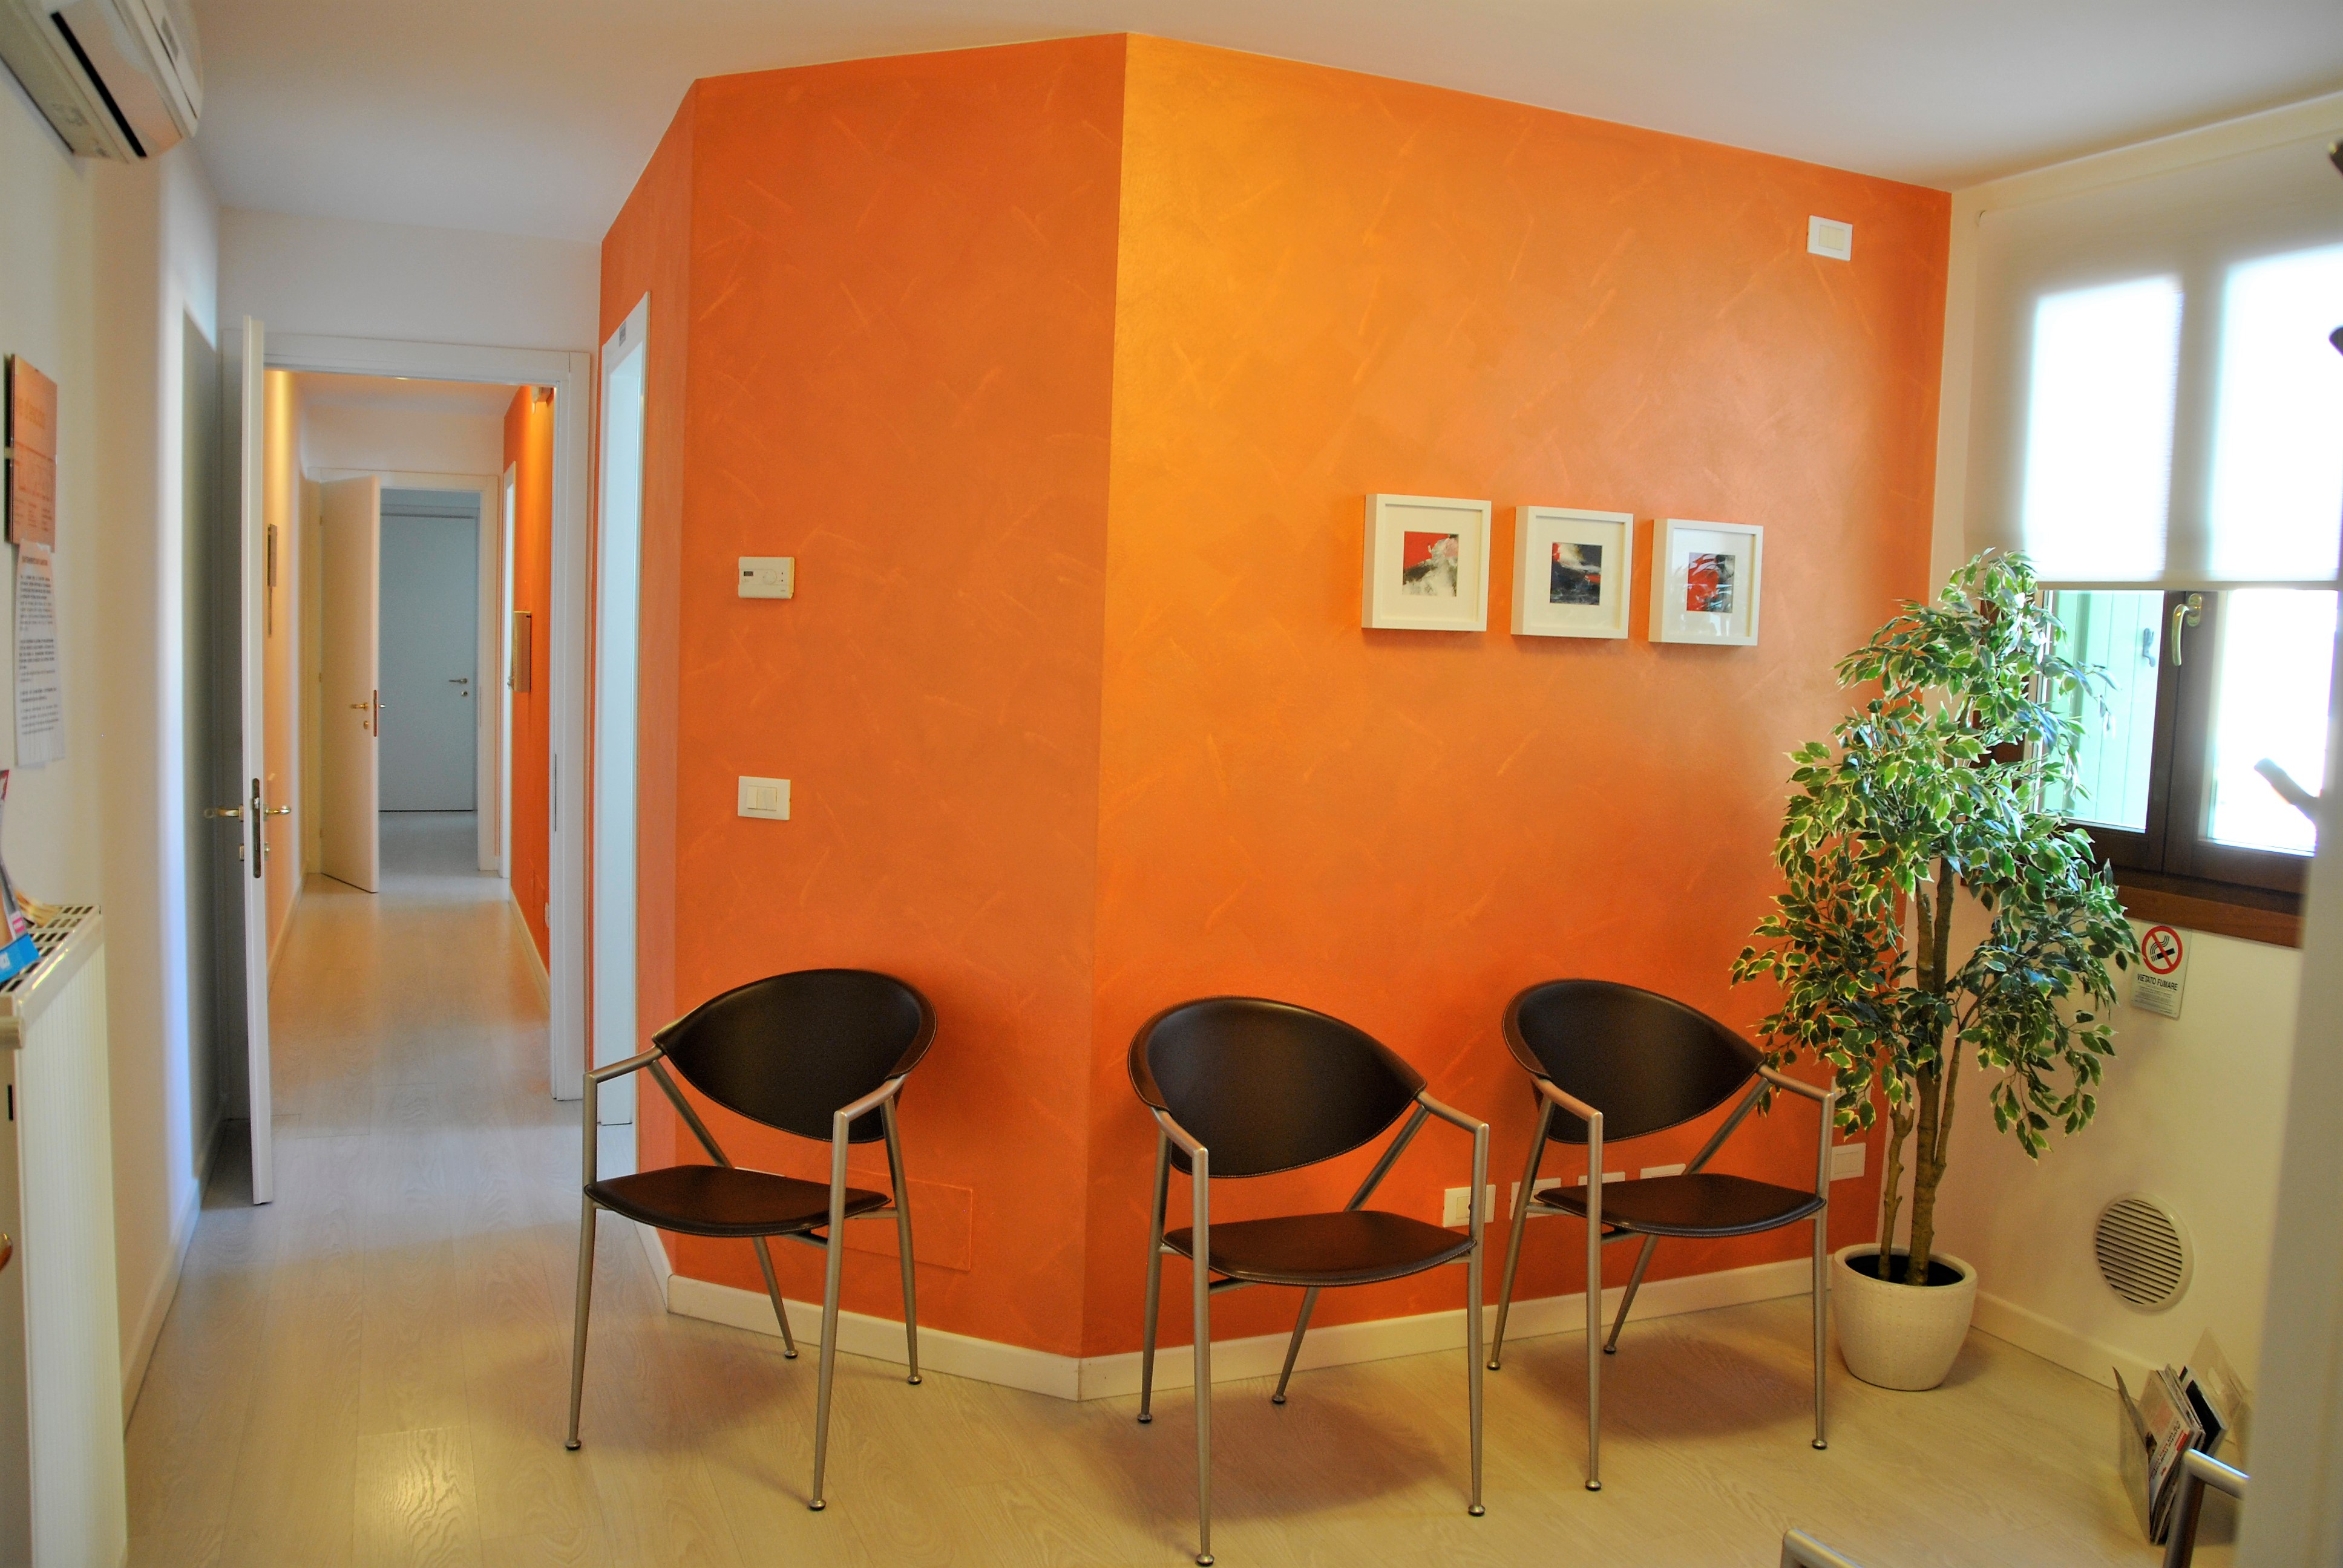 Studio dentistico Medilang Gorizia